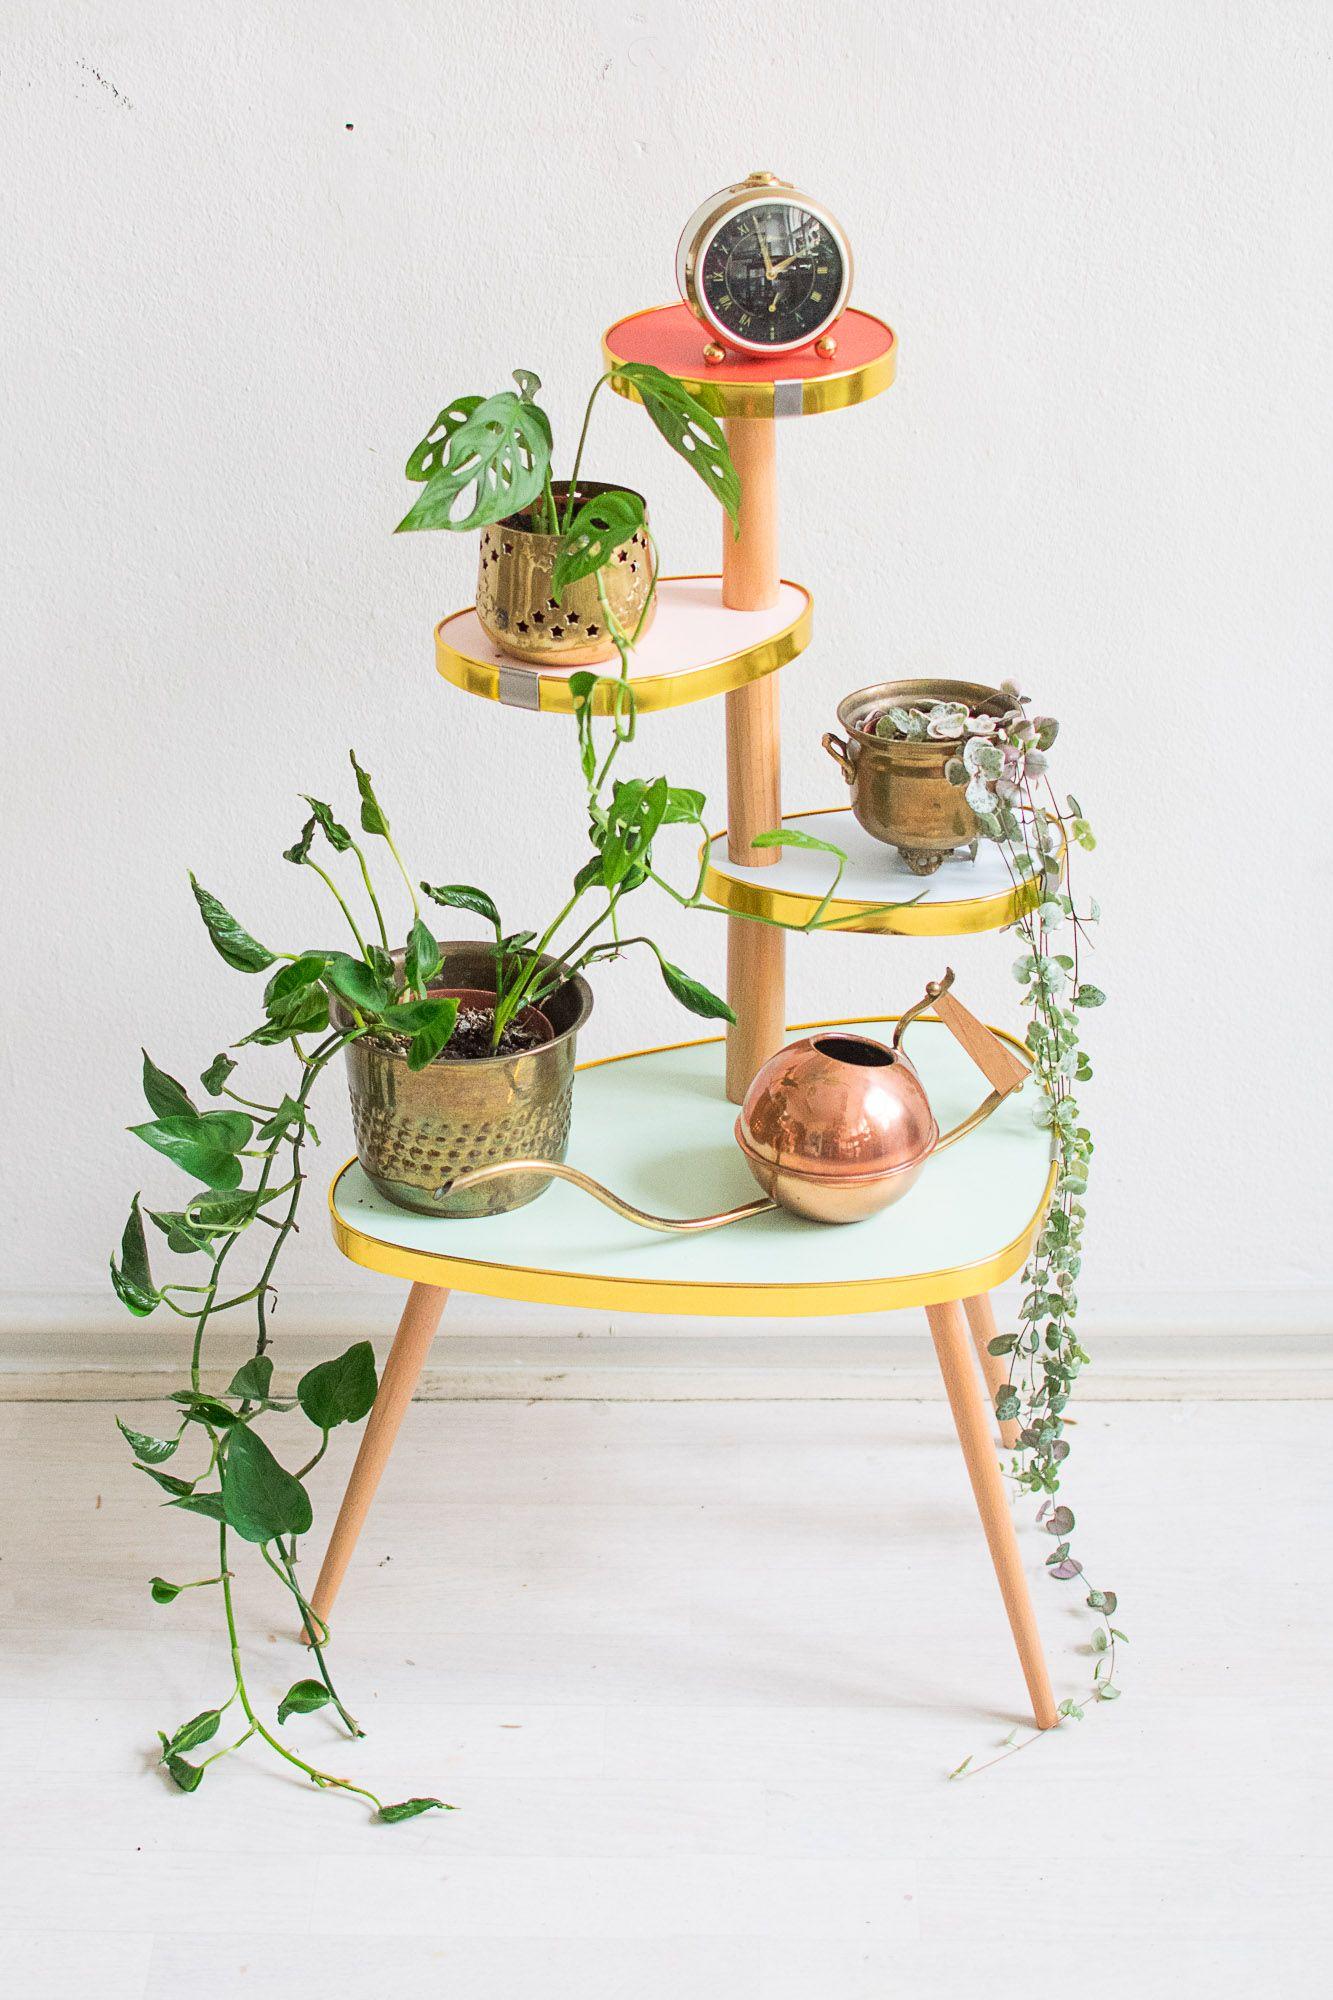 Green Living – Recycling Möbel und ökologische Materialien